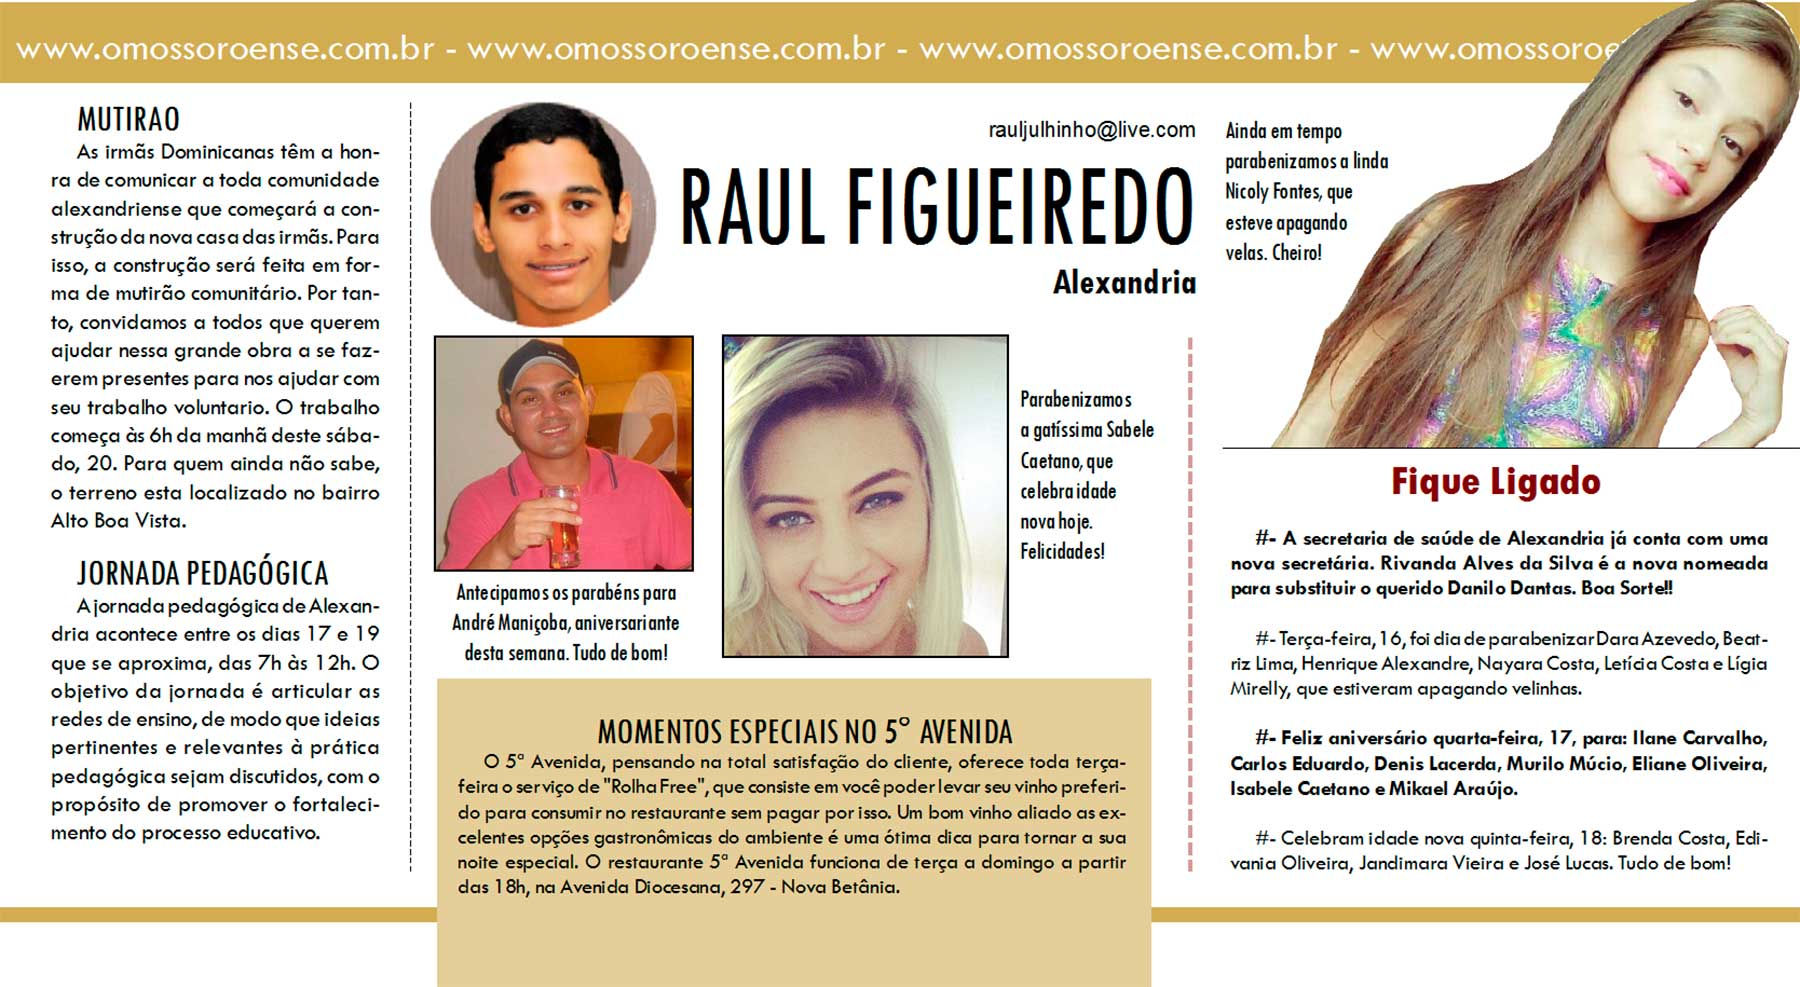 RAUL-FIGUEIREDO---ALEXANDRIA---16-02-2016